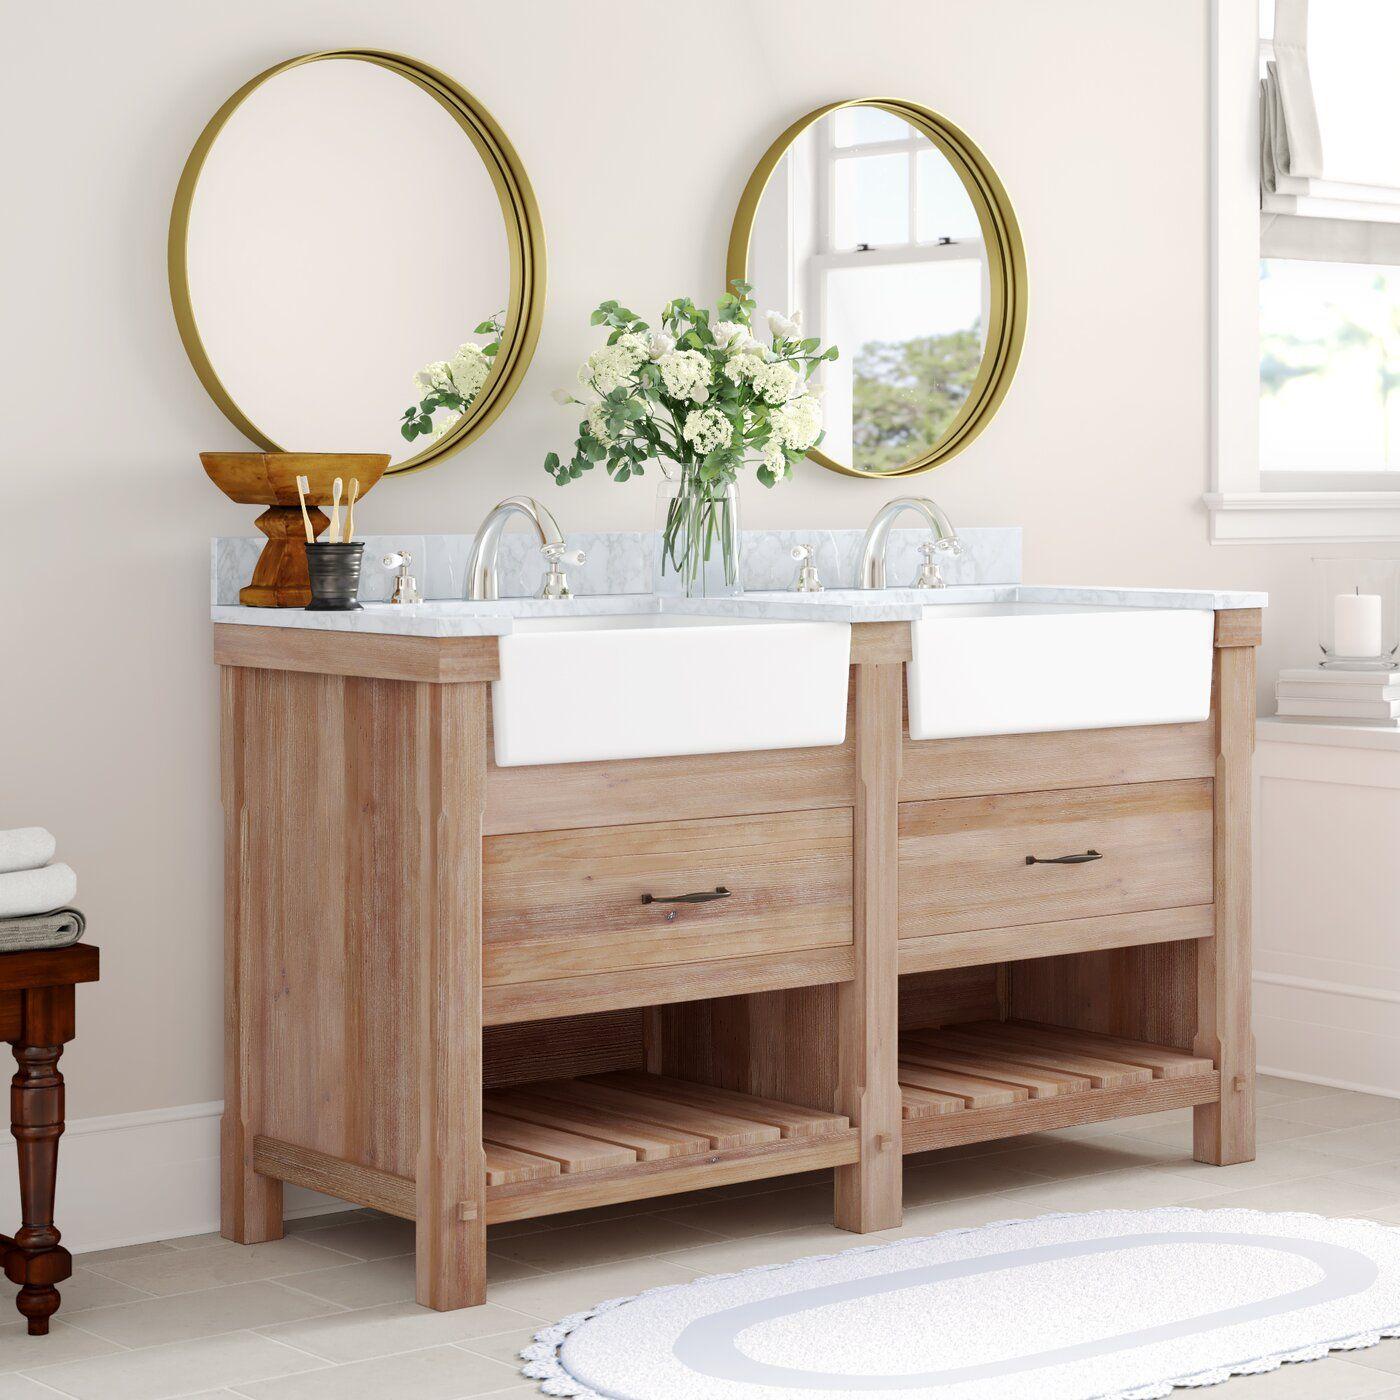 Kordell 60 Double Bathroom Vanity Double Vanity Bathroom Bathroom Vanity Vanity